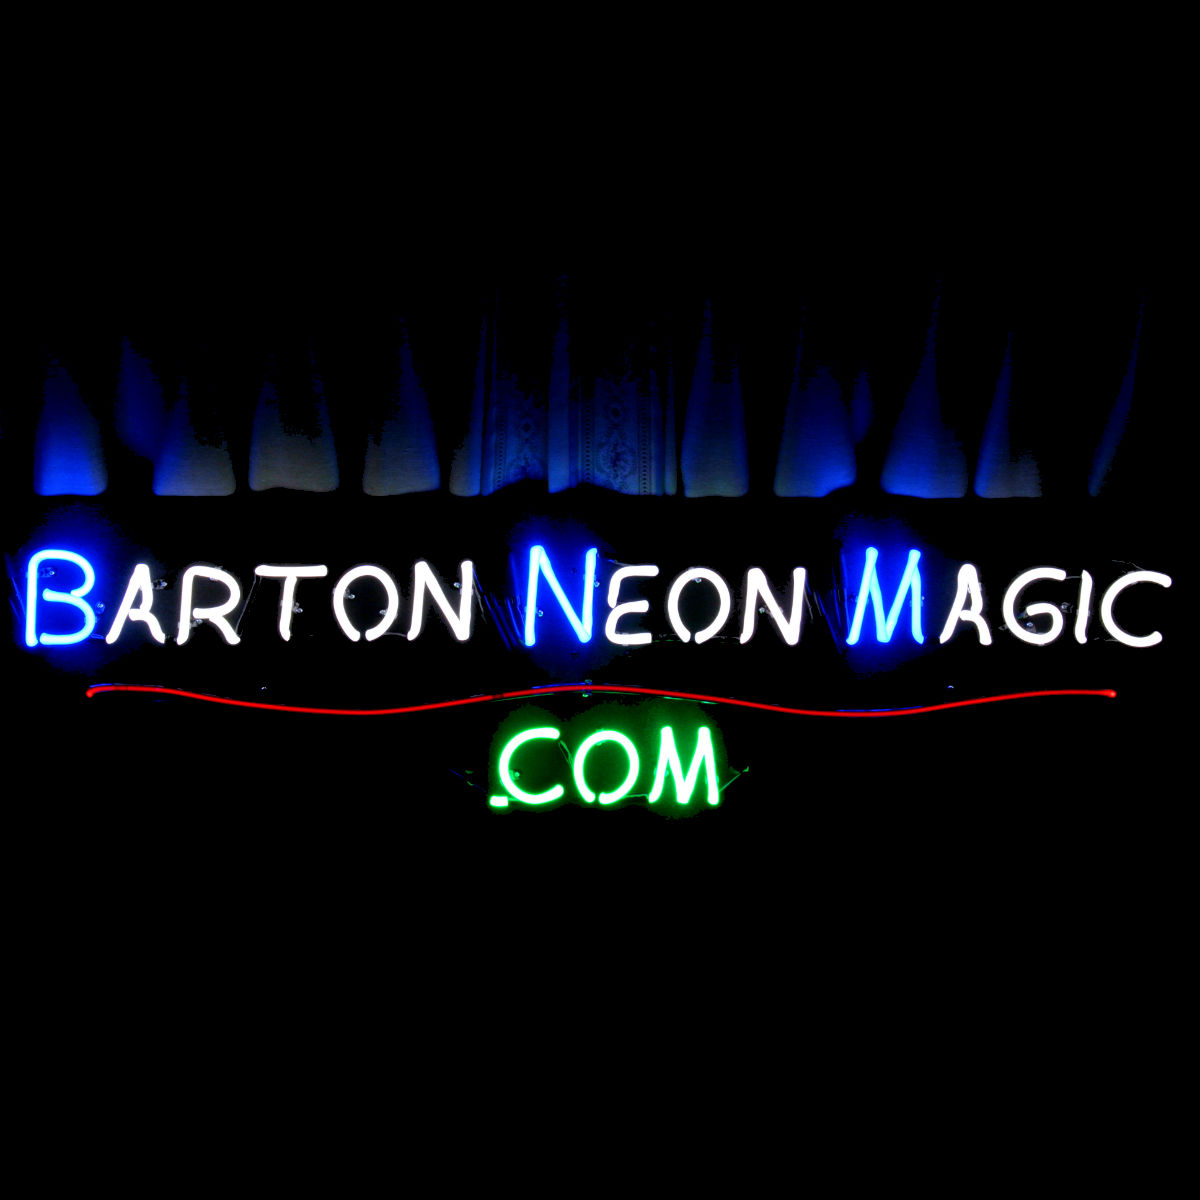 BartonNeonMagic.com - the ultimate in Fine Quality Neon Light Sculptures